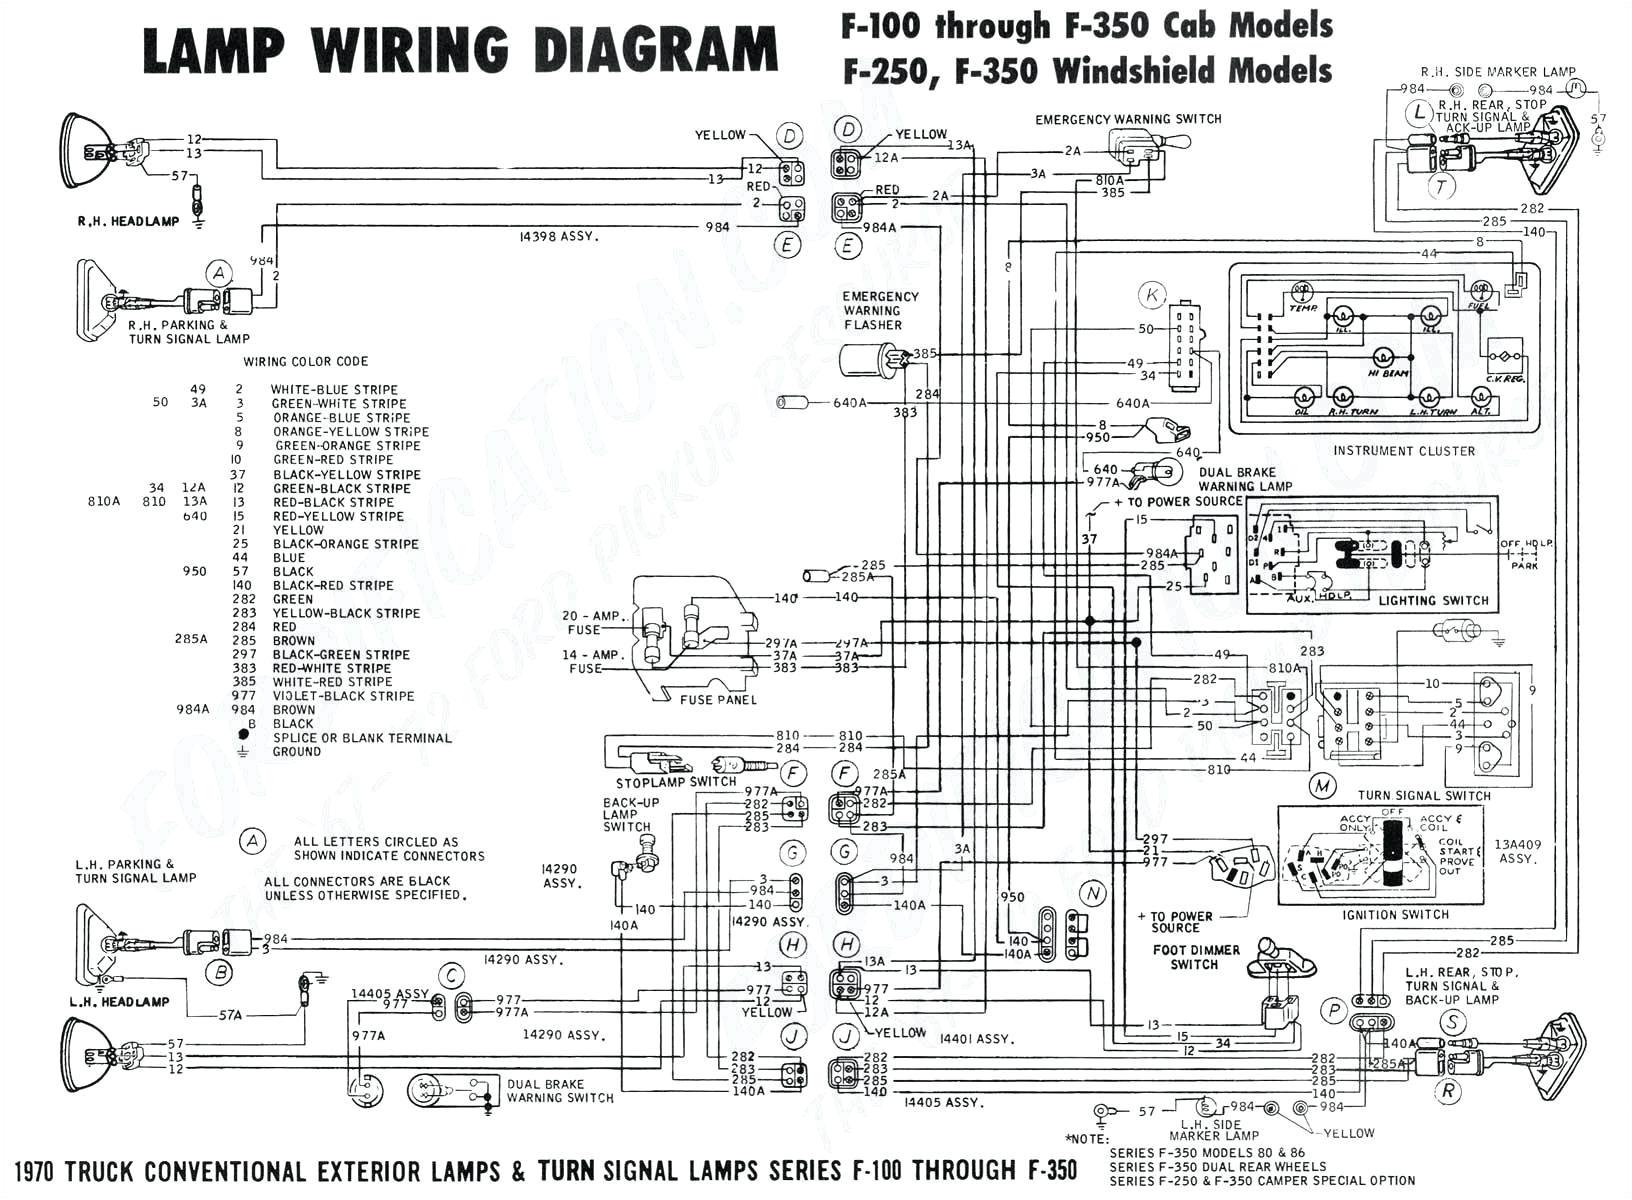 1999 ford Ranger Fuel Pump Wiring Diagram 1996 Ranger Wiring Diagram Schema Wiring Diagram